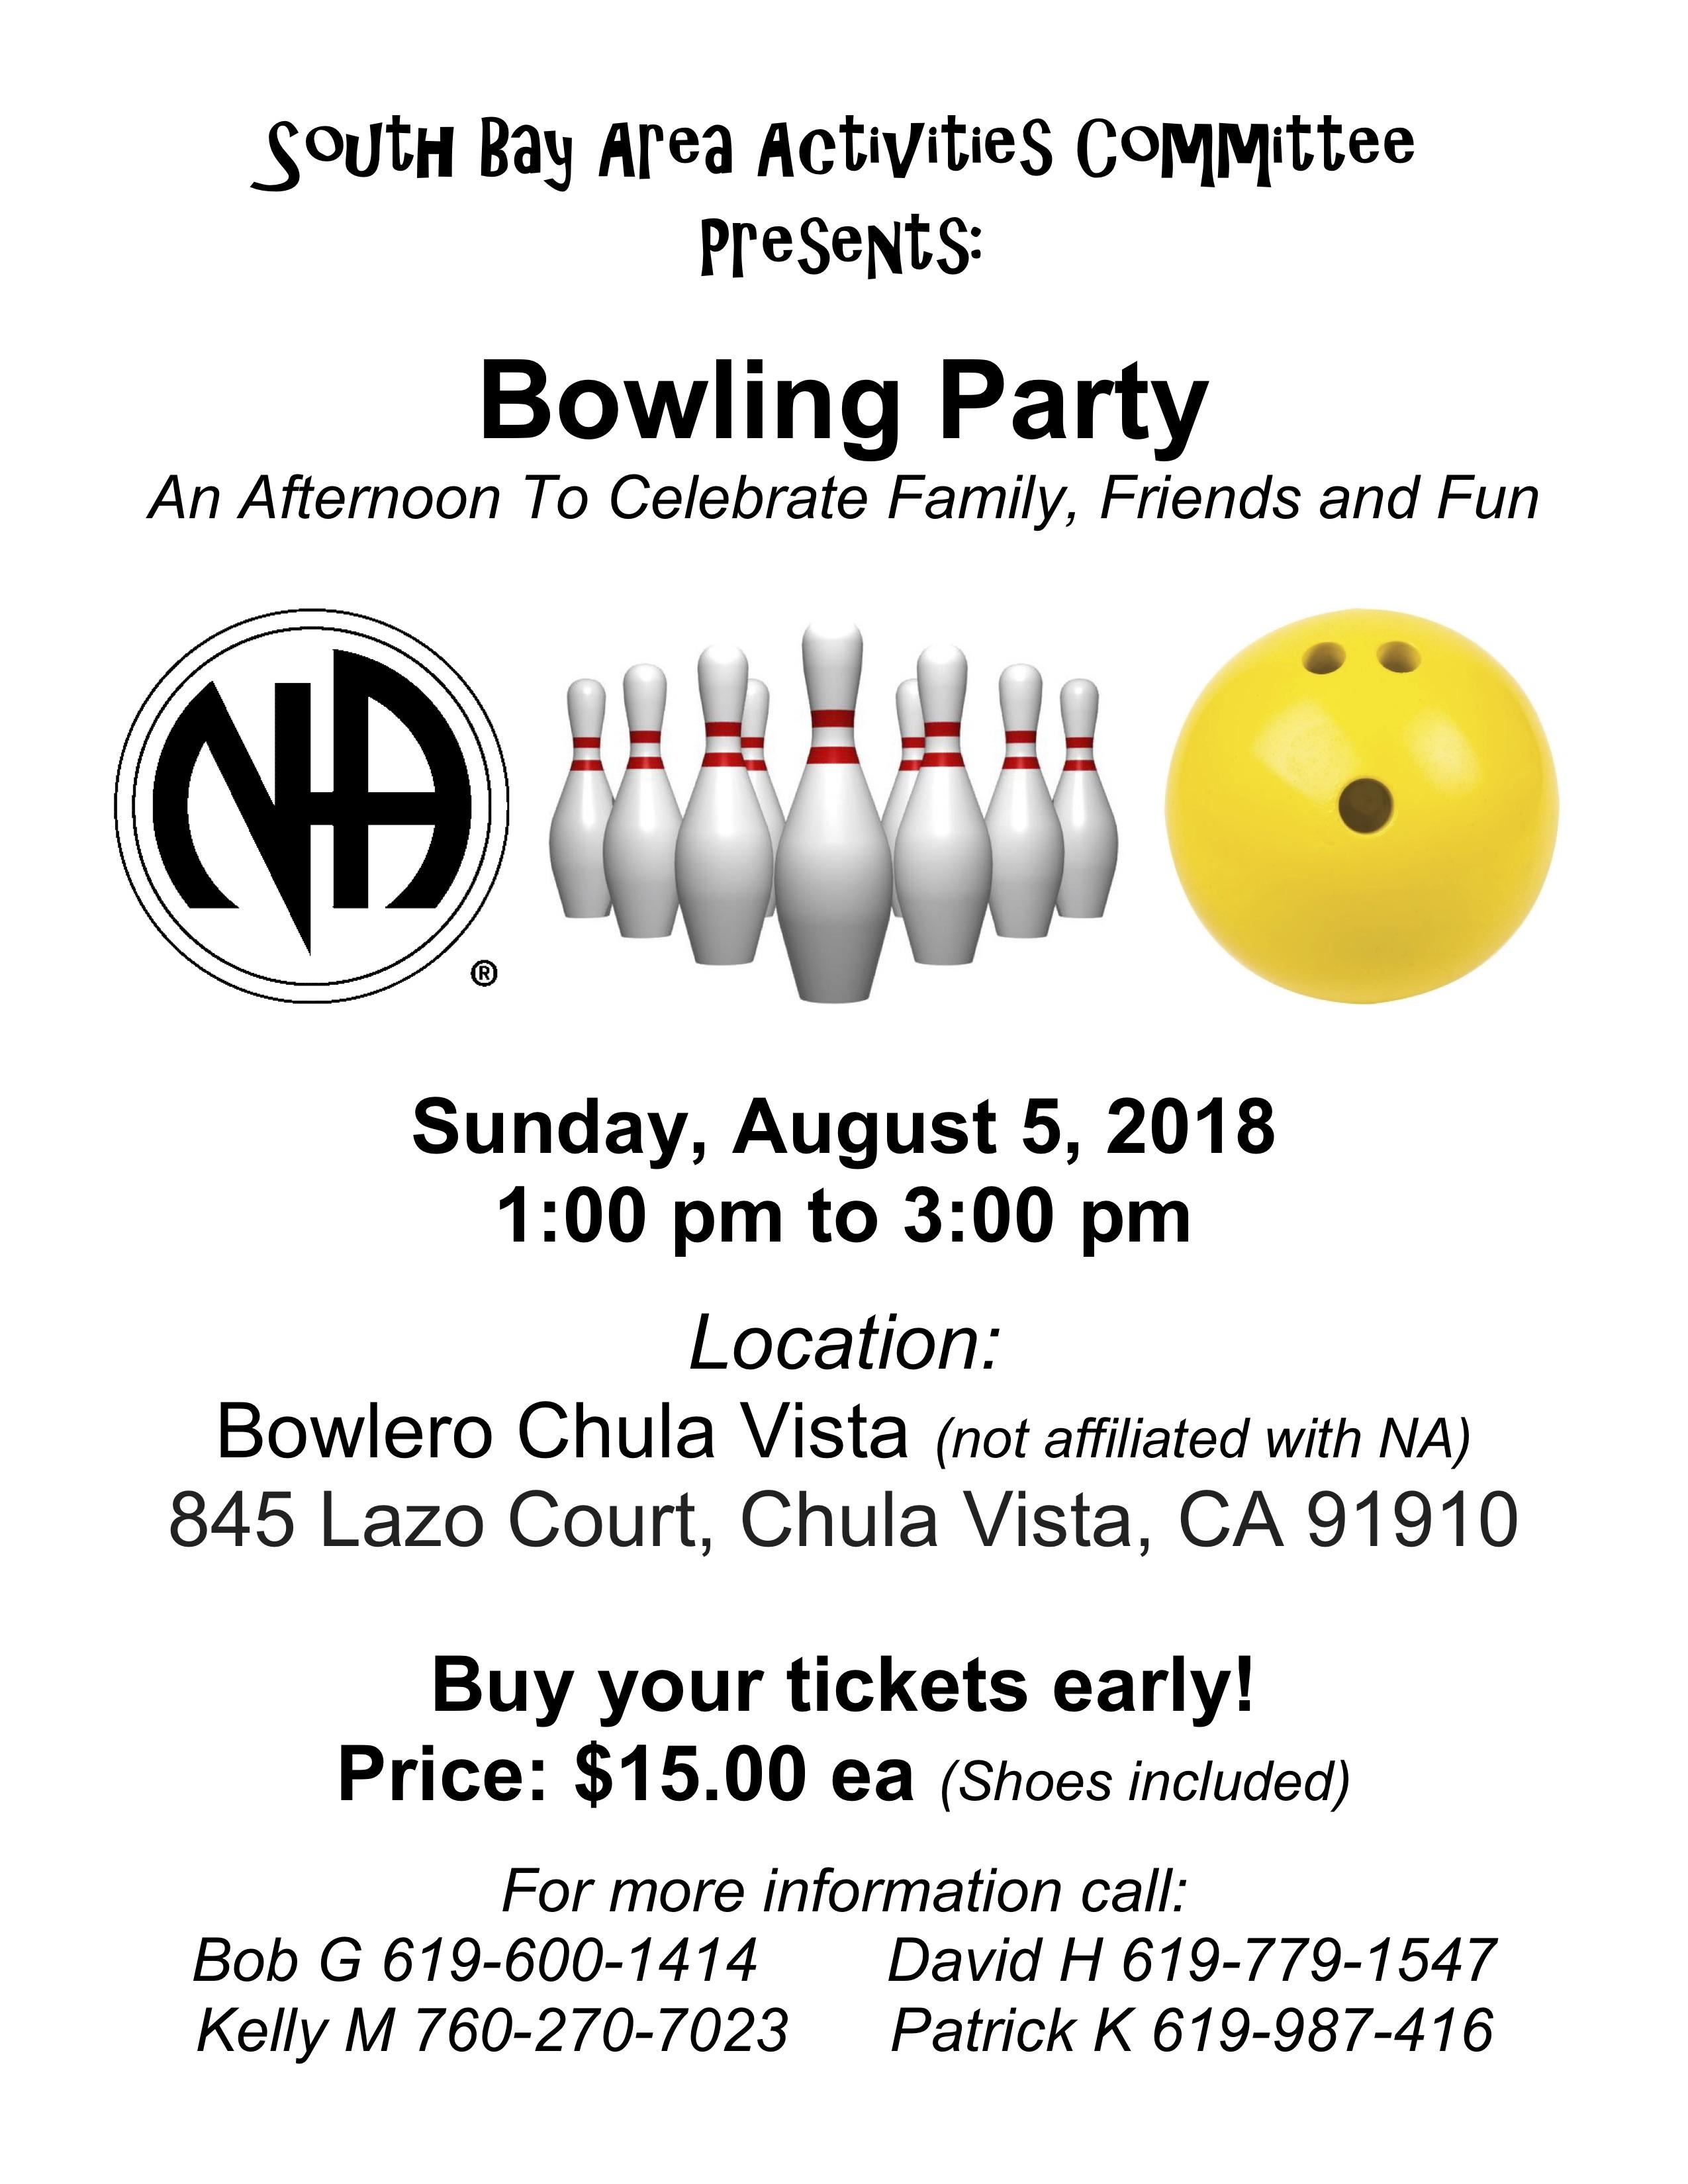 www sandiegona org » South Bay Bowling Party